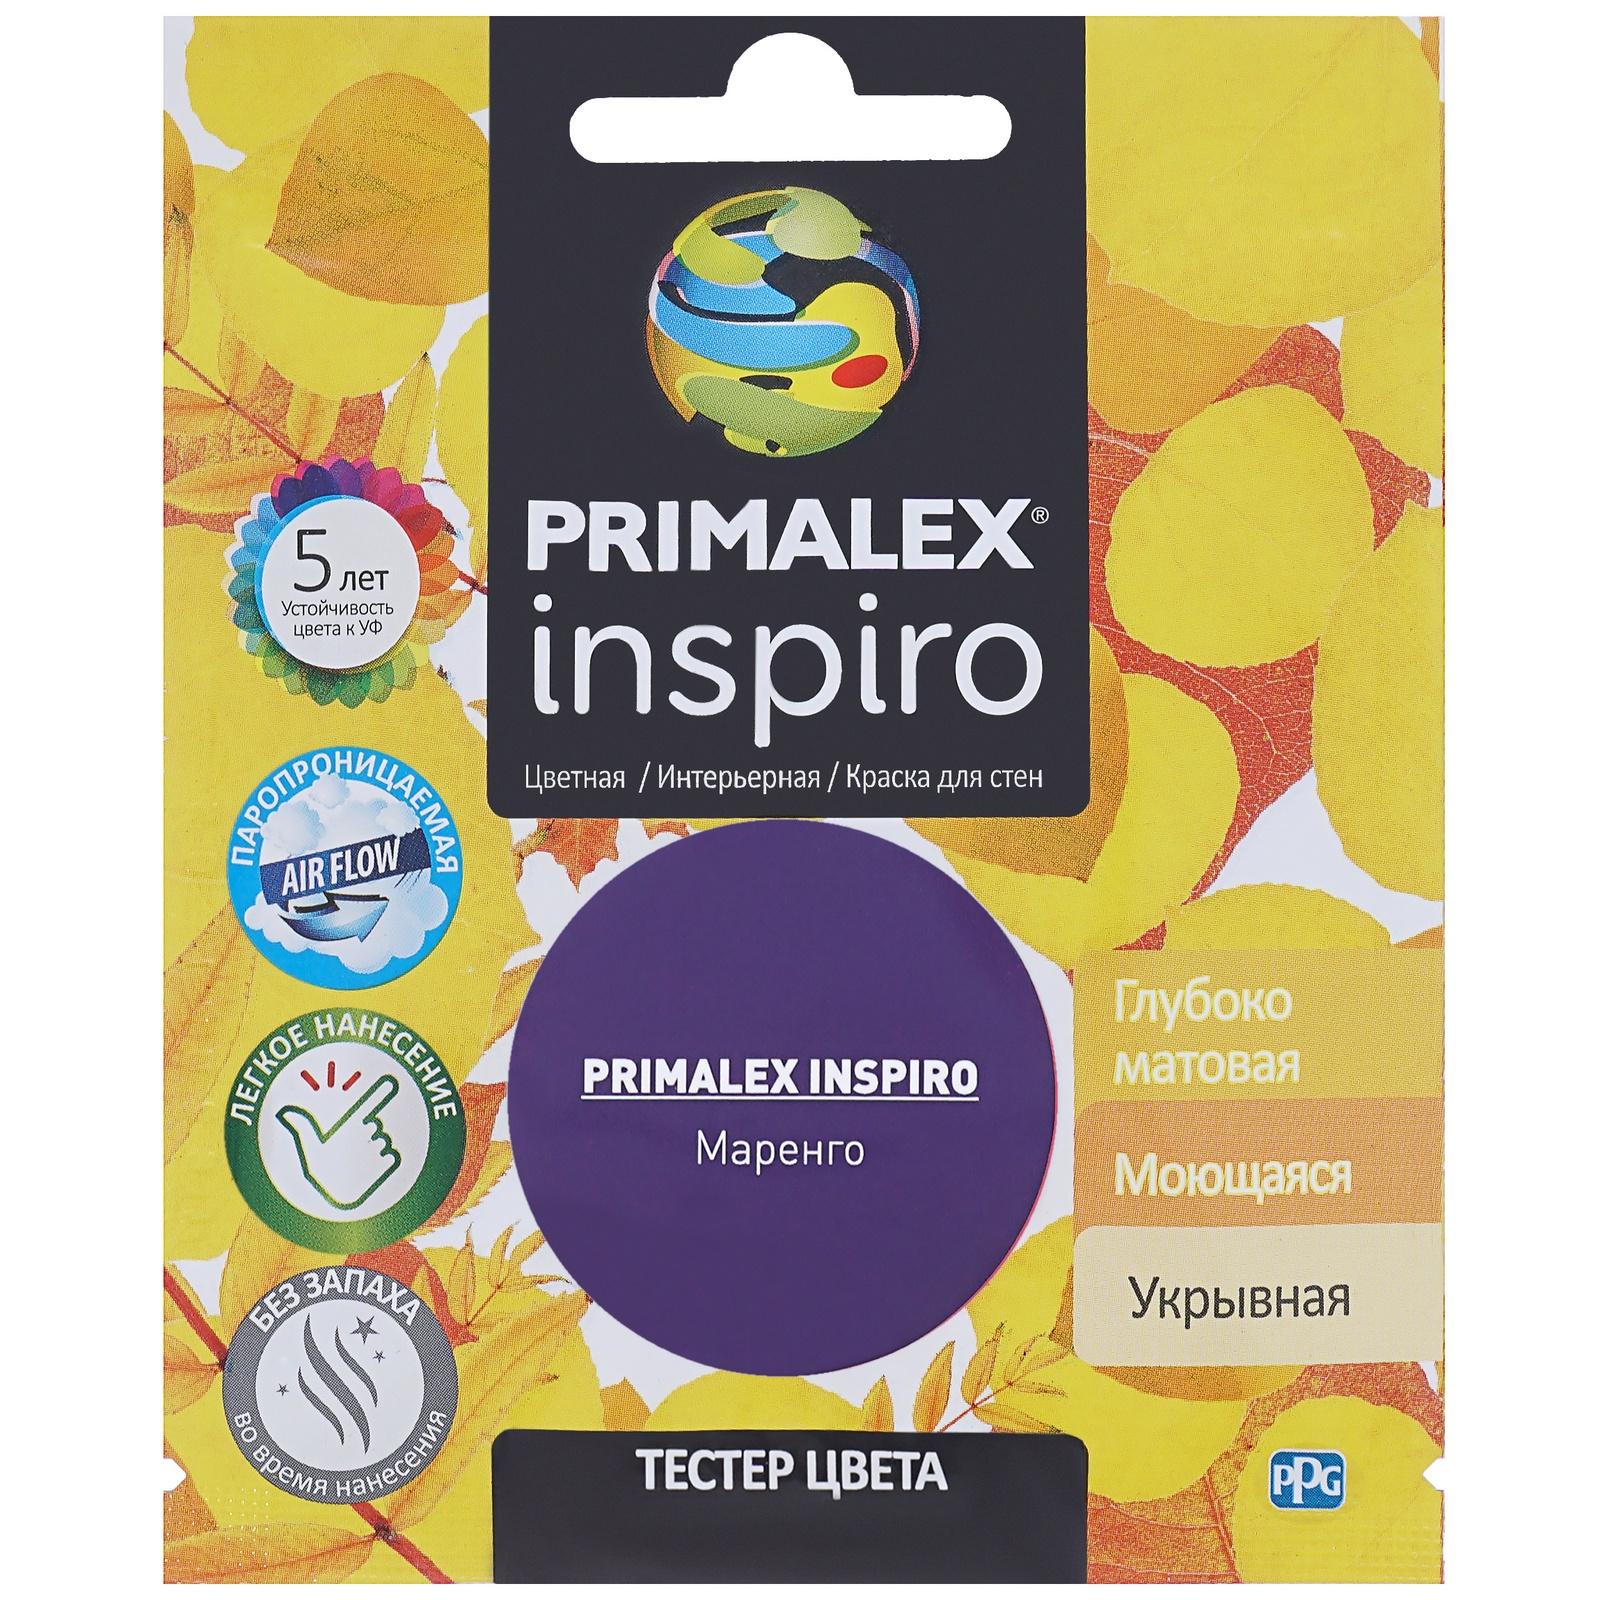 Краска PPG Primalex Inspiro Маренго 40мл краска ppg primalex inspiro красный мак 40мл pmx i47